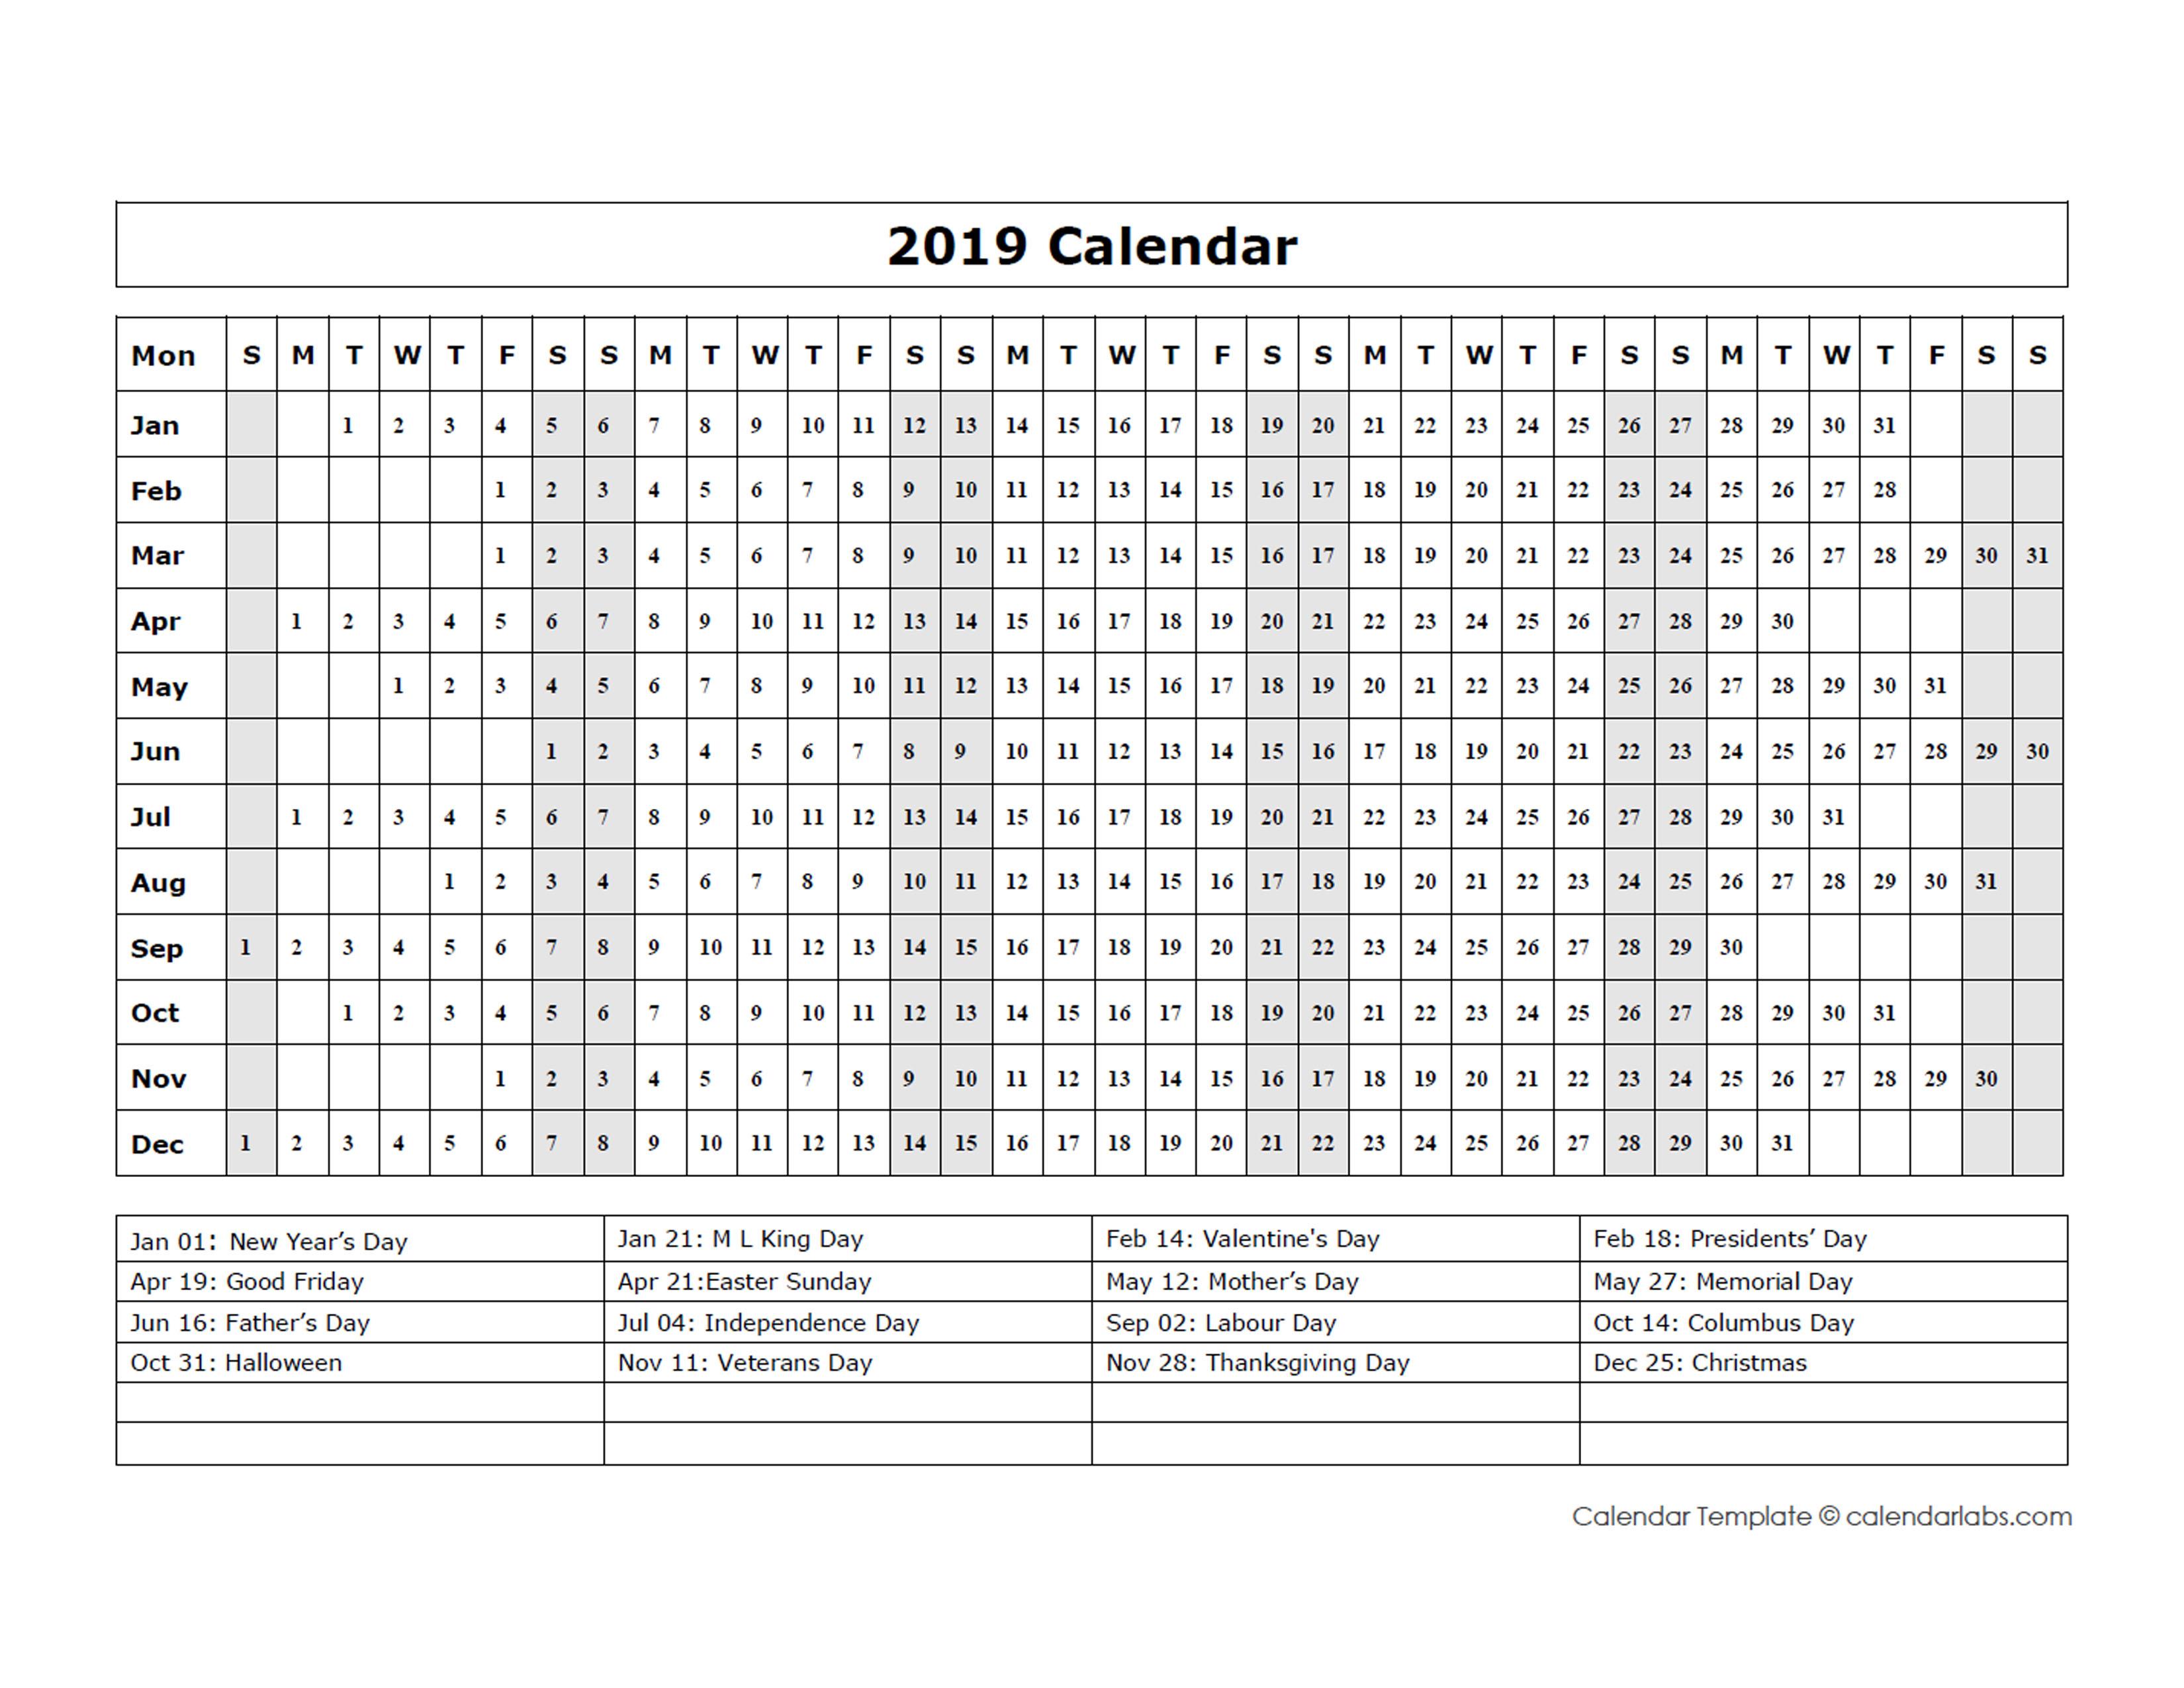 2019 year at a glance calendar printable